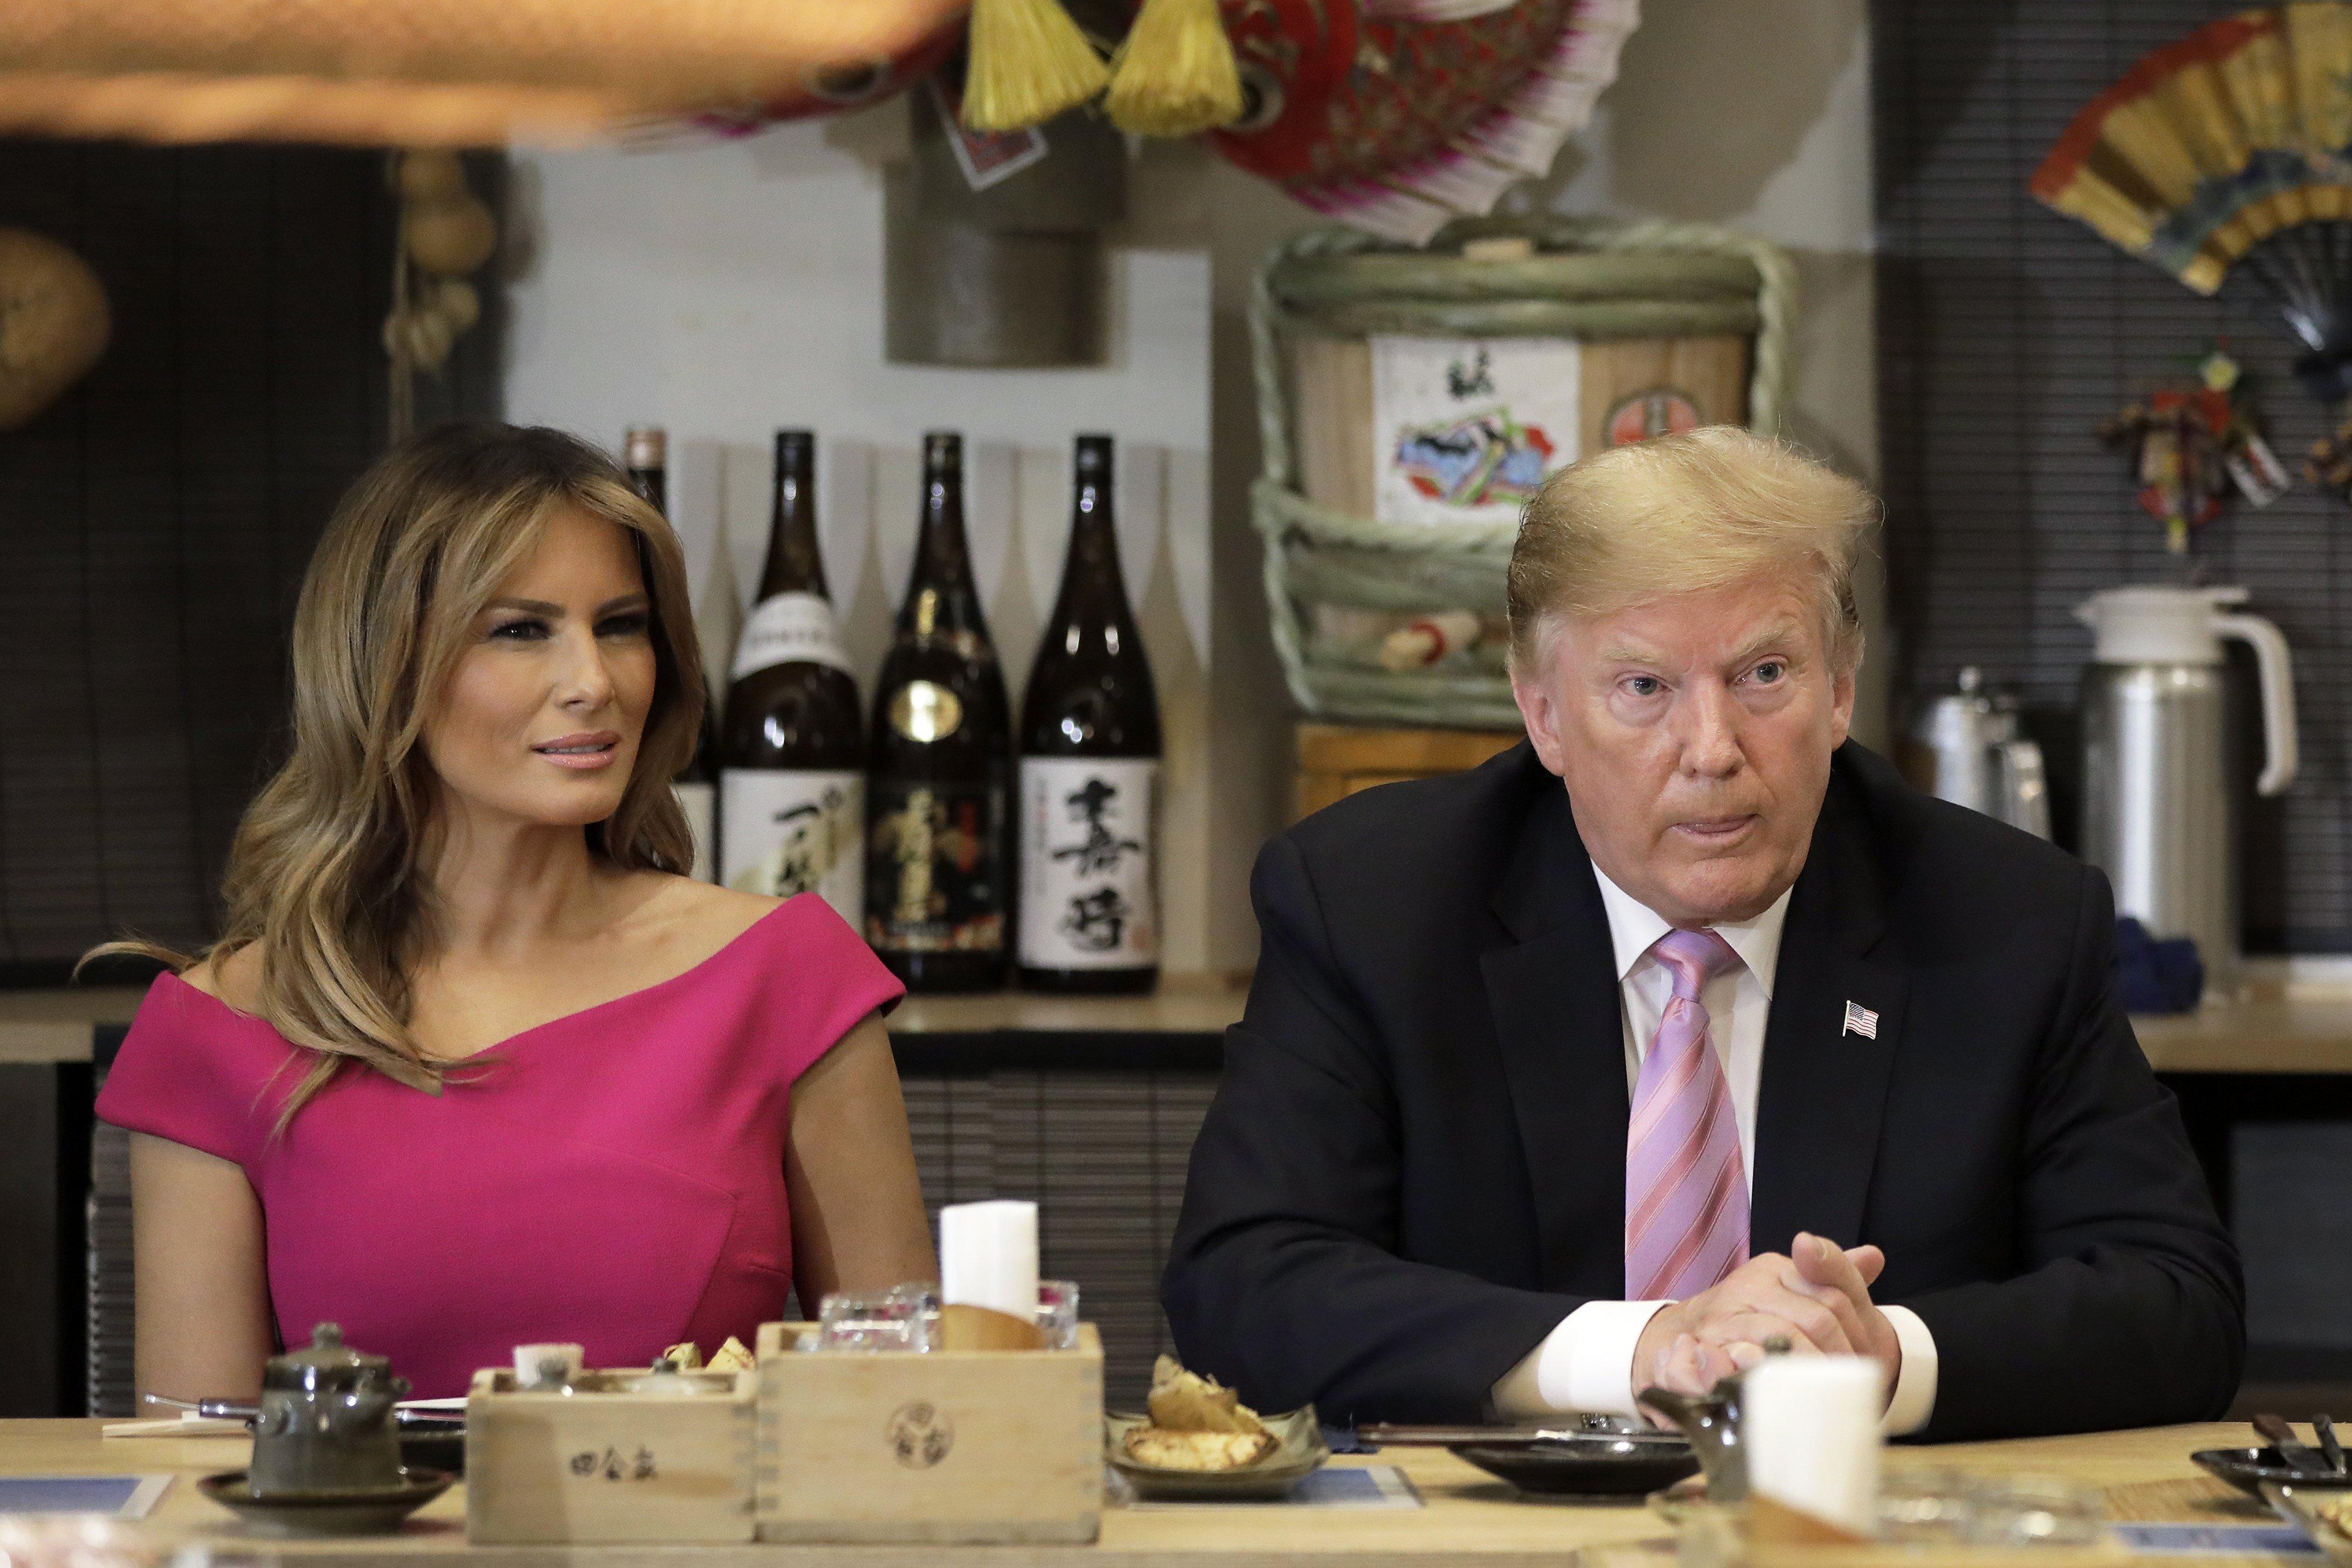 Donald Trump and Melania Trump at the Inakaya restaurant in Tokyo, Japan   Photo: Getty Images